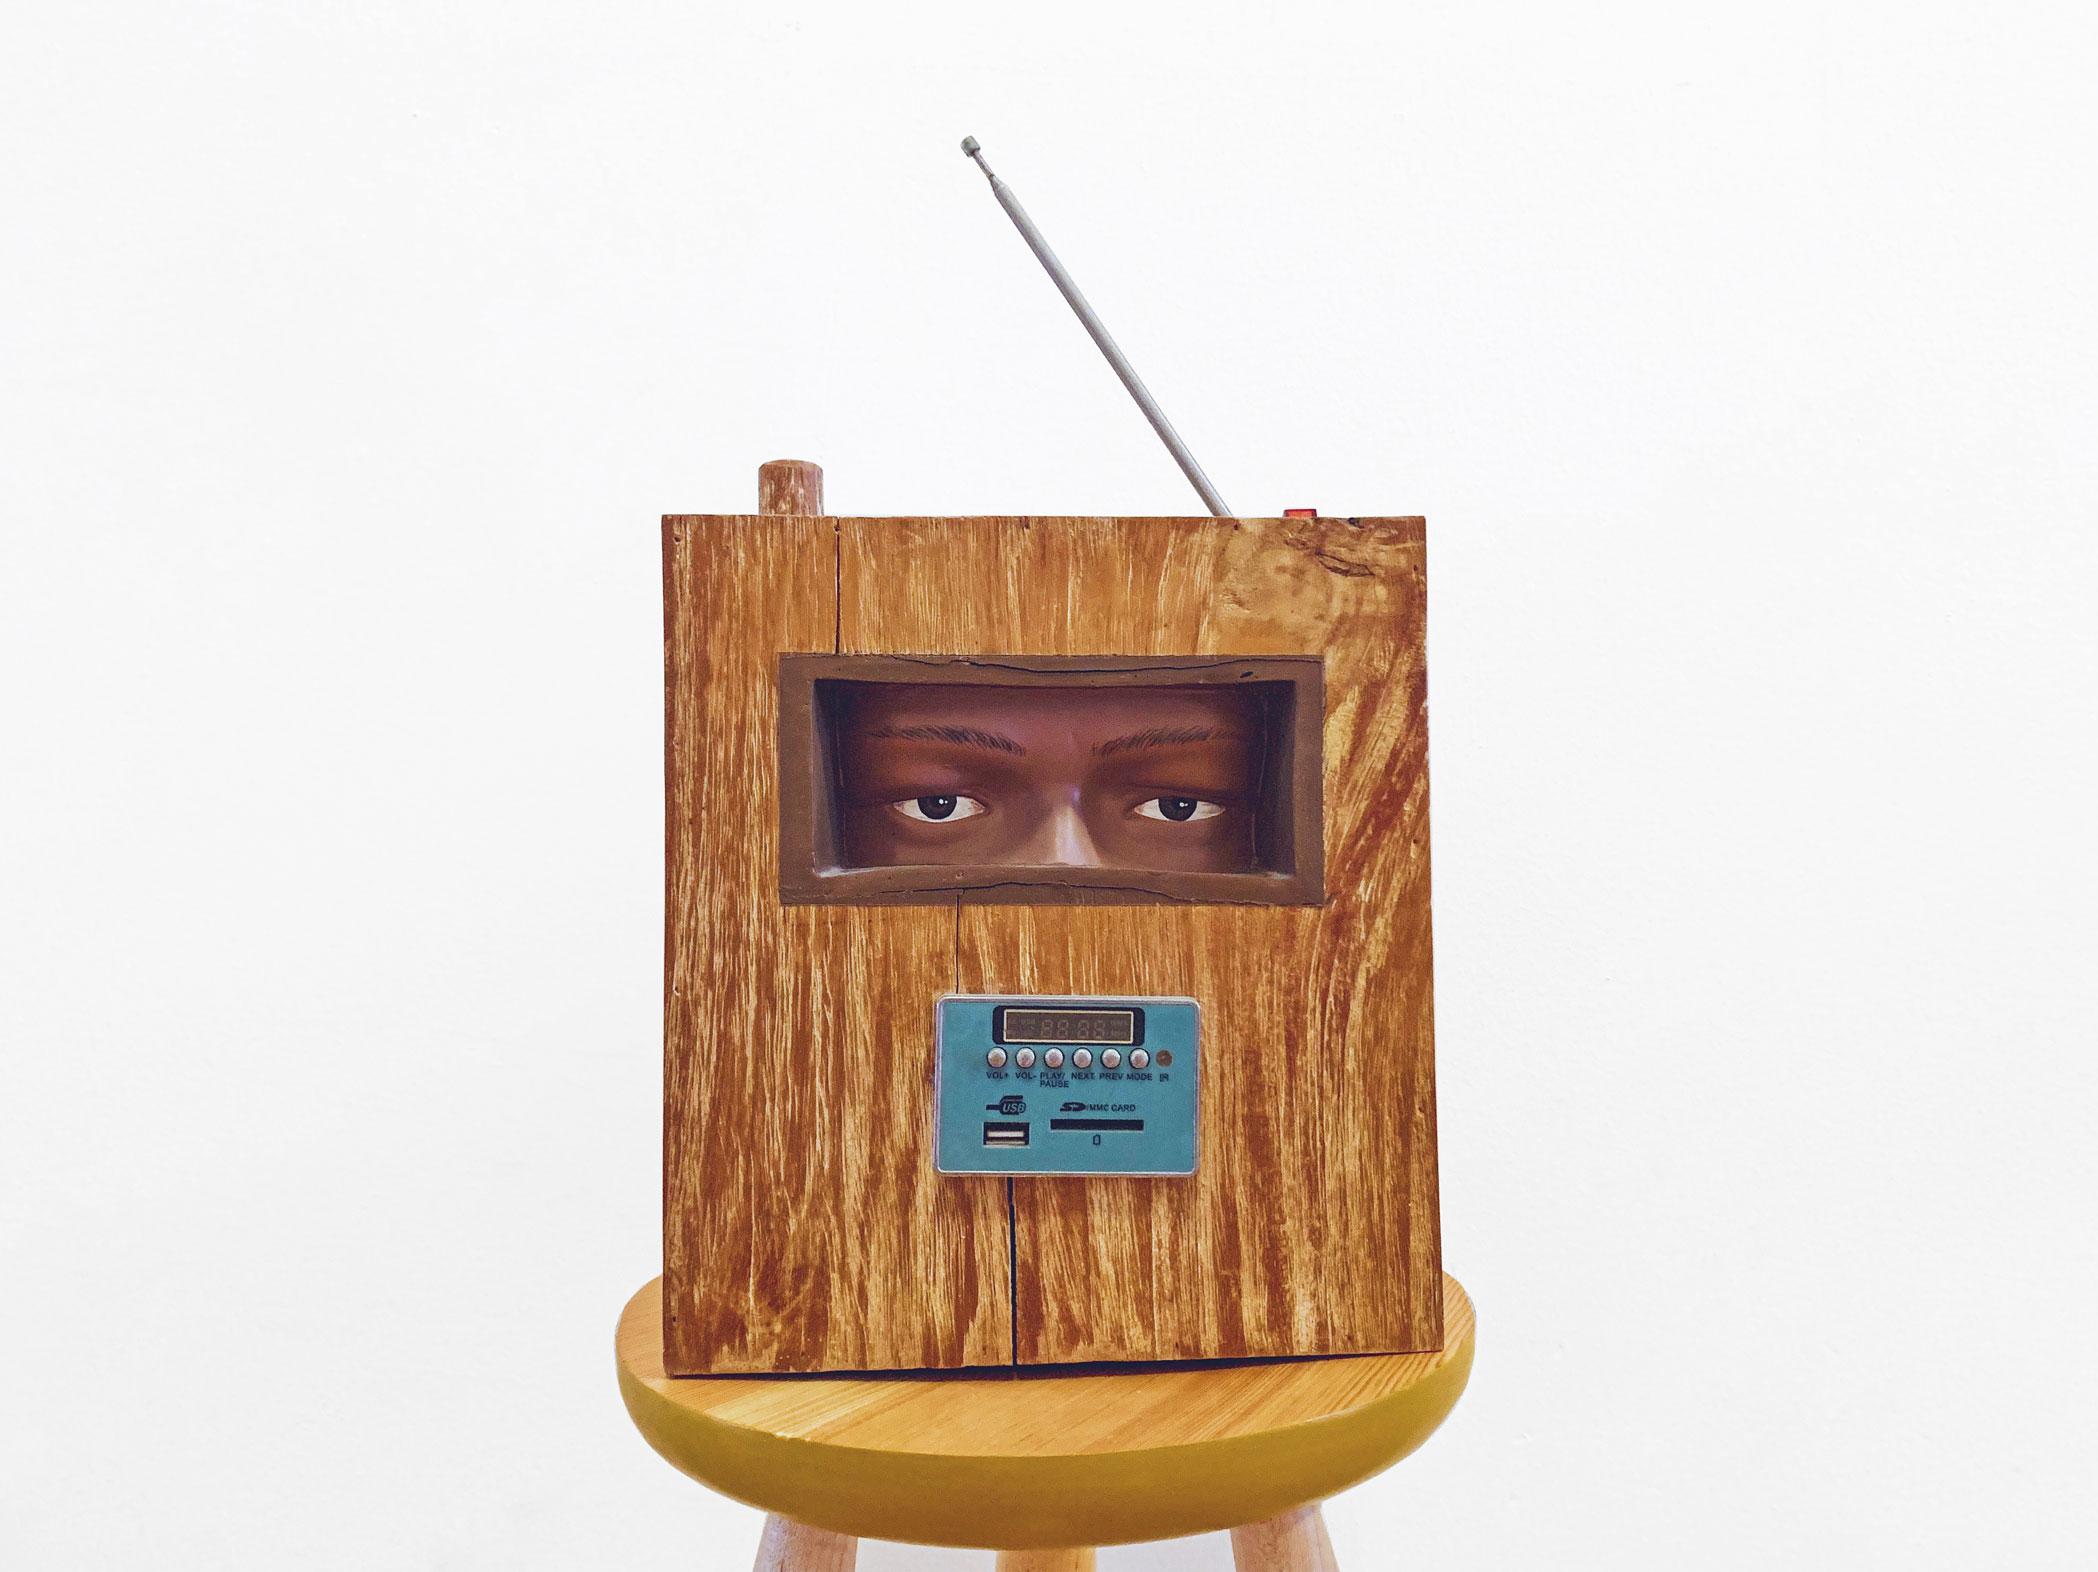 Eko Nugroho/The Witness, 2010